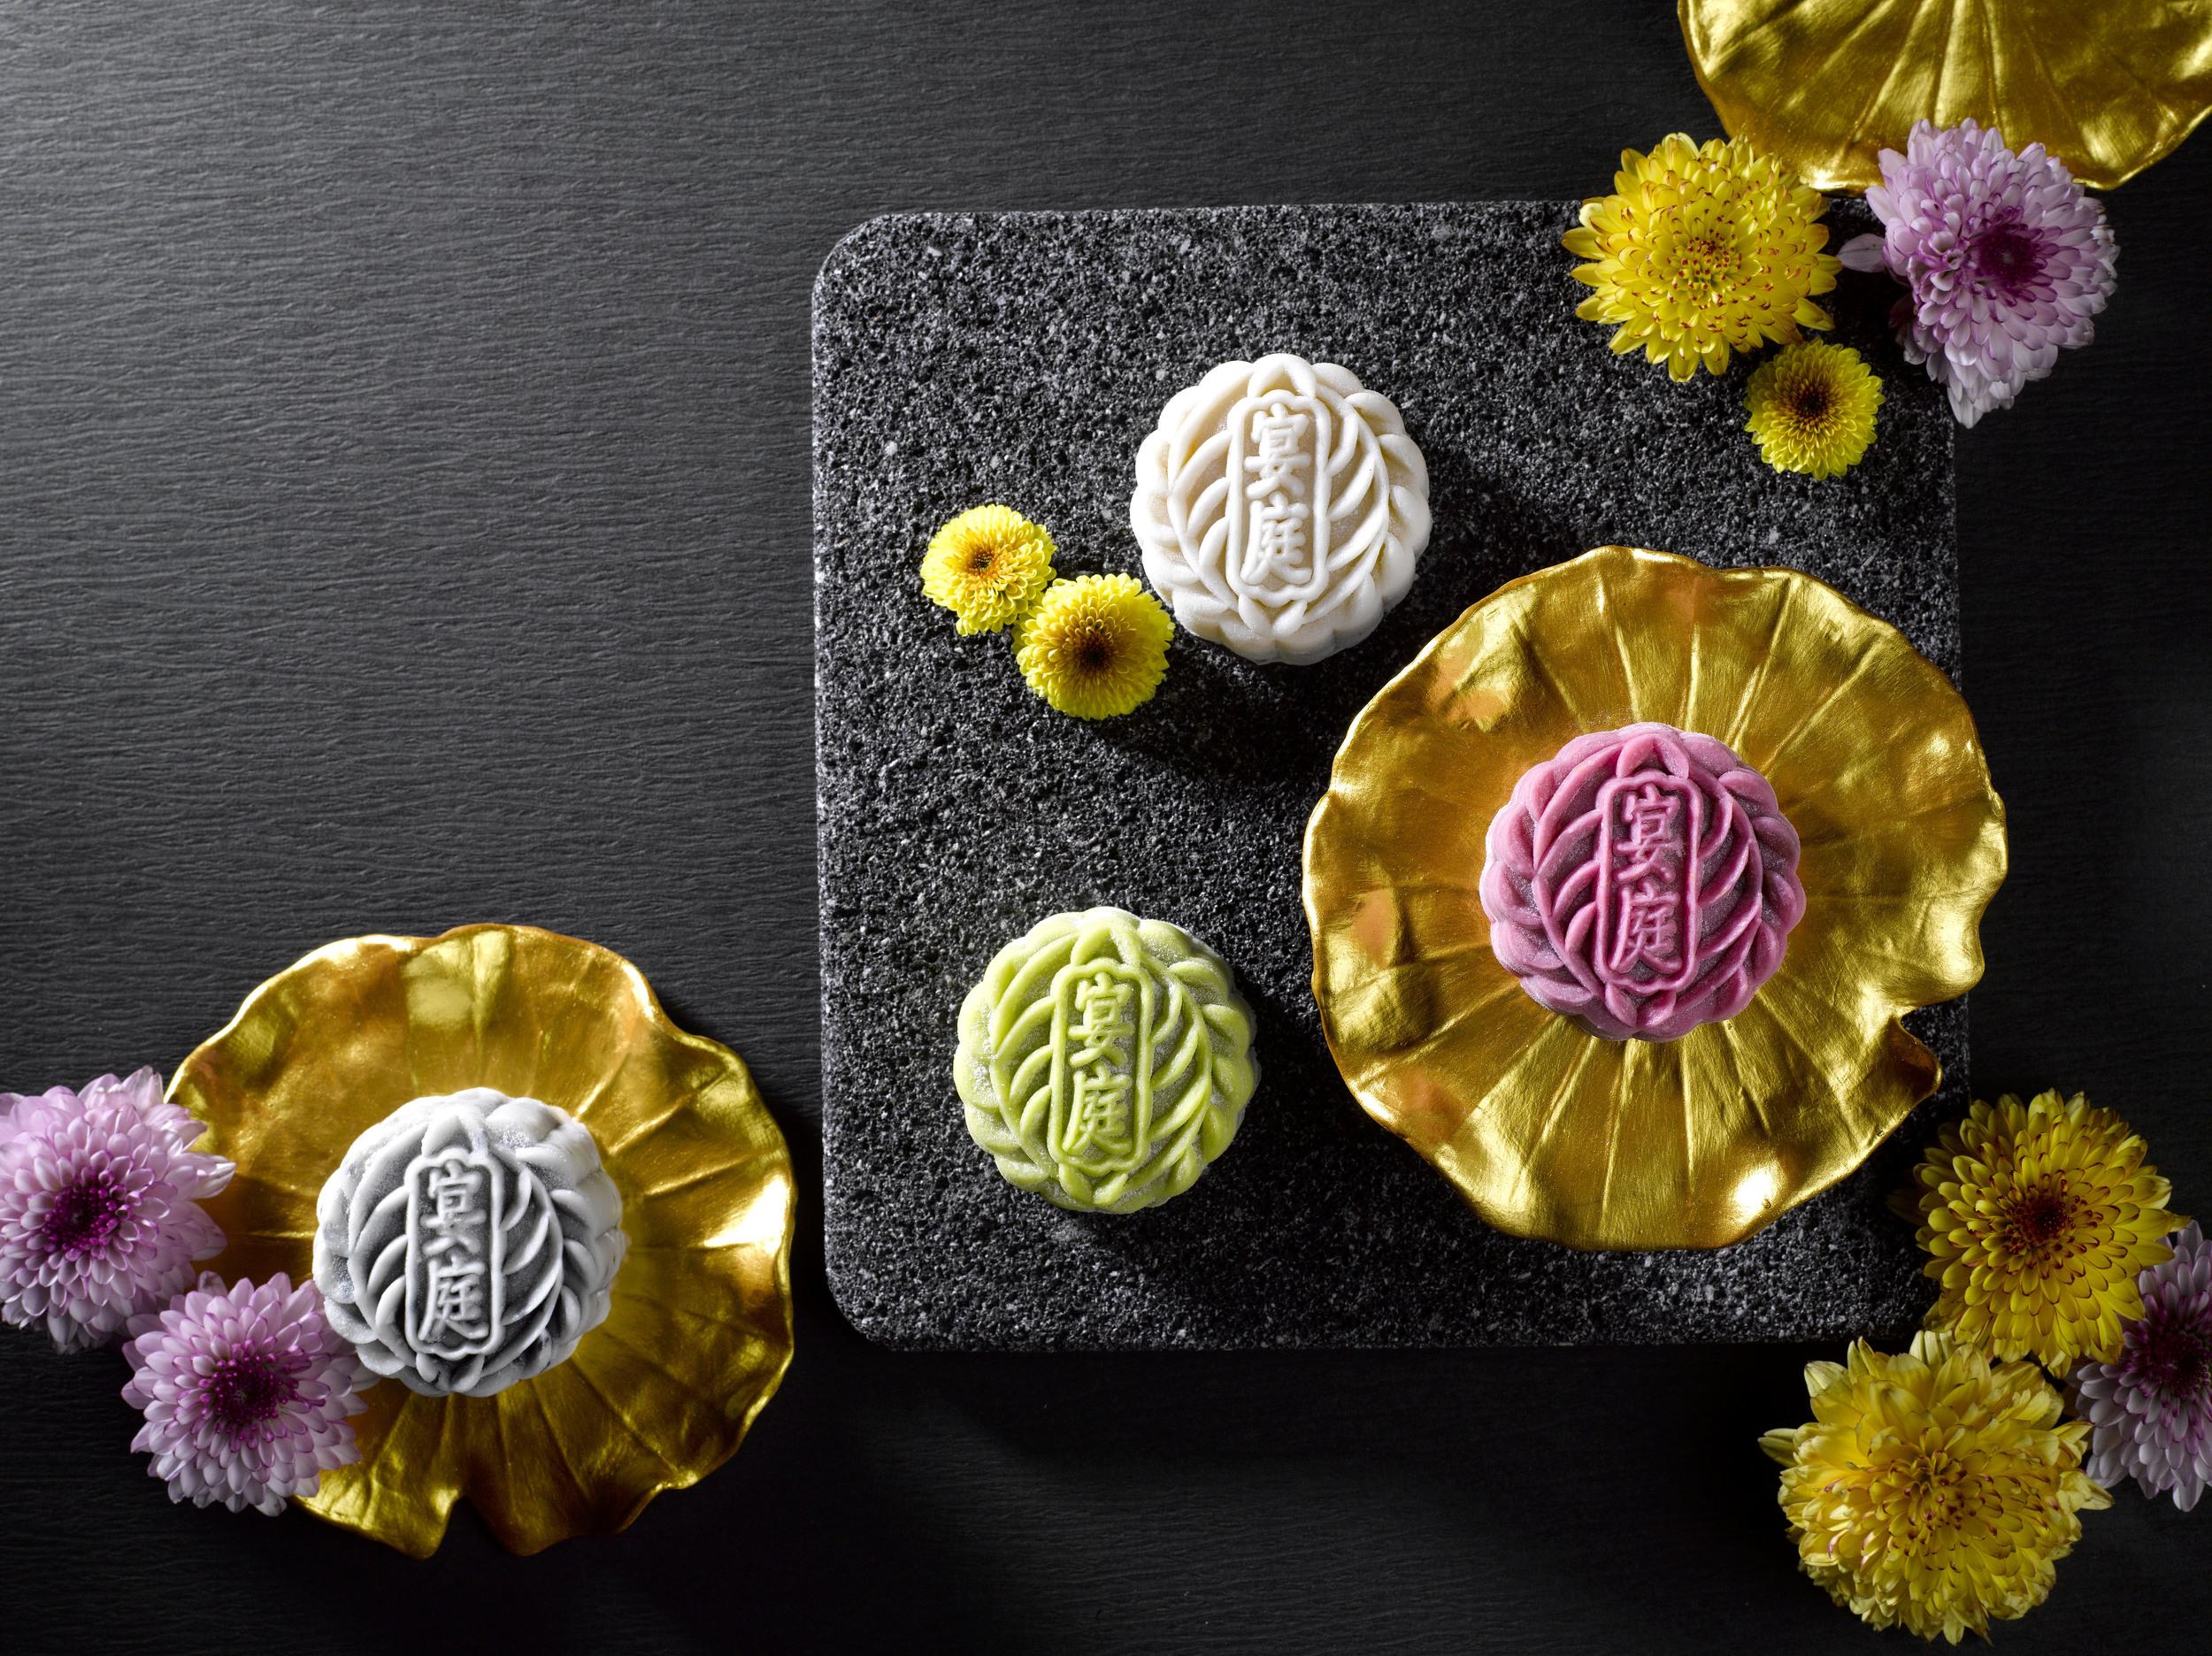 The St Regis Singapore Assorted Snowskin Mooncakes (S$75+ for a box of 8)| Photo Credit: The St. Regis Singapore